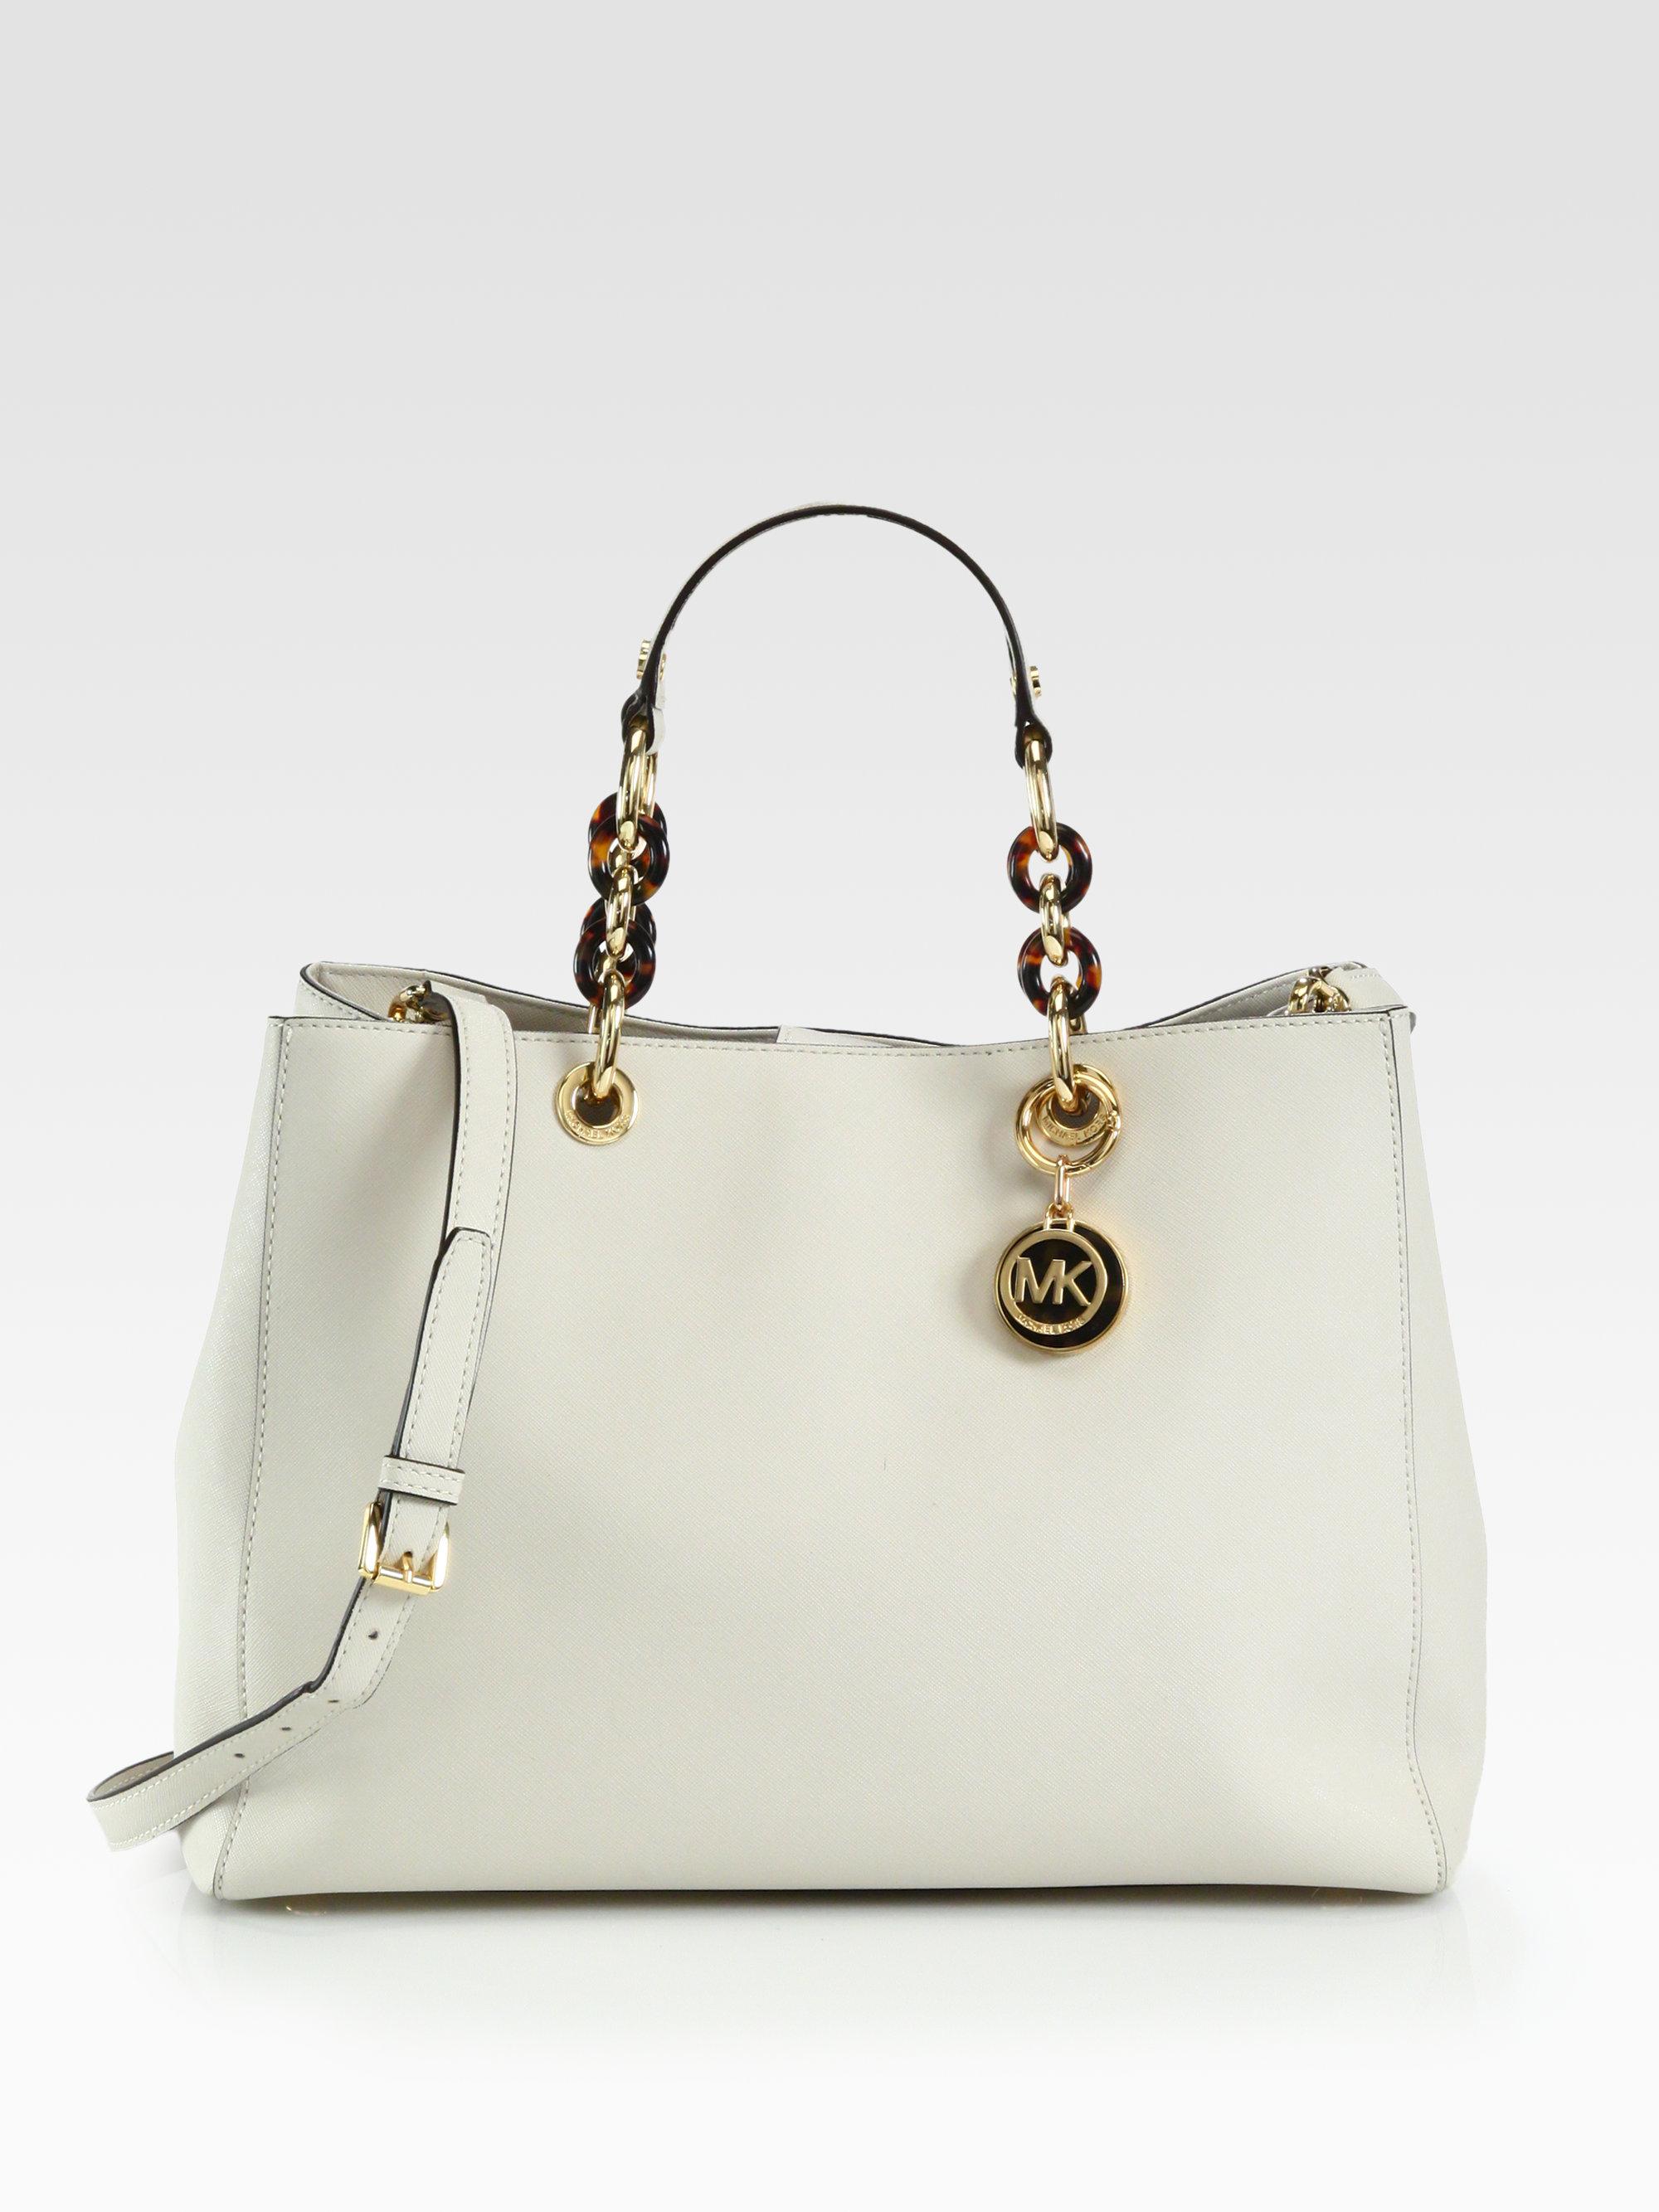 a5b554b49d25 ... shop lyst michael michael kors cynthia large satchel in natural e95df  a07be